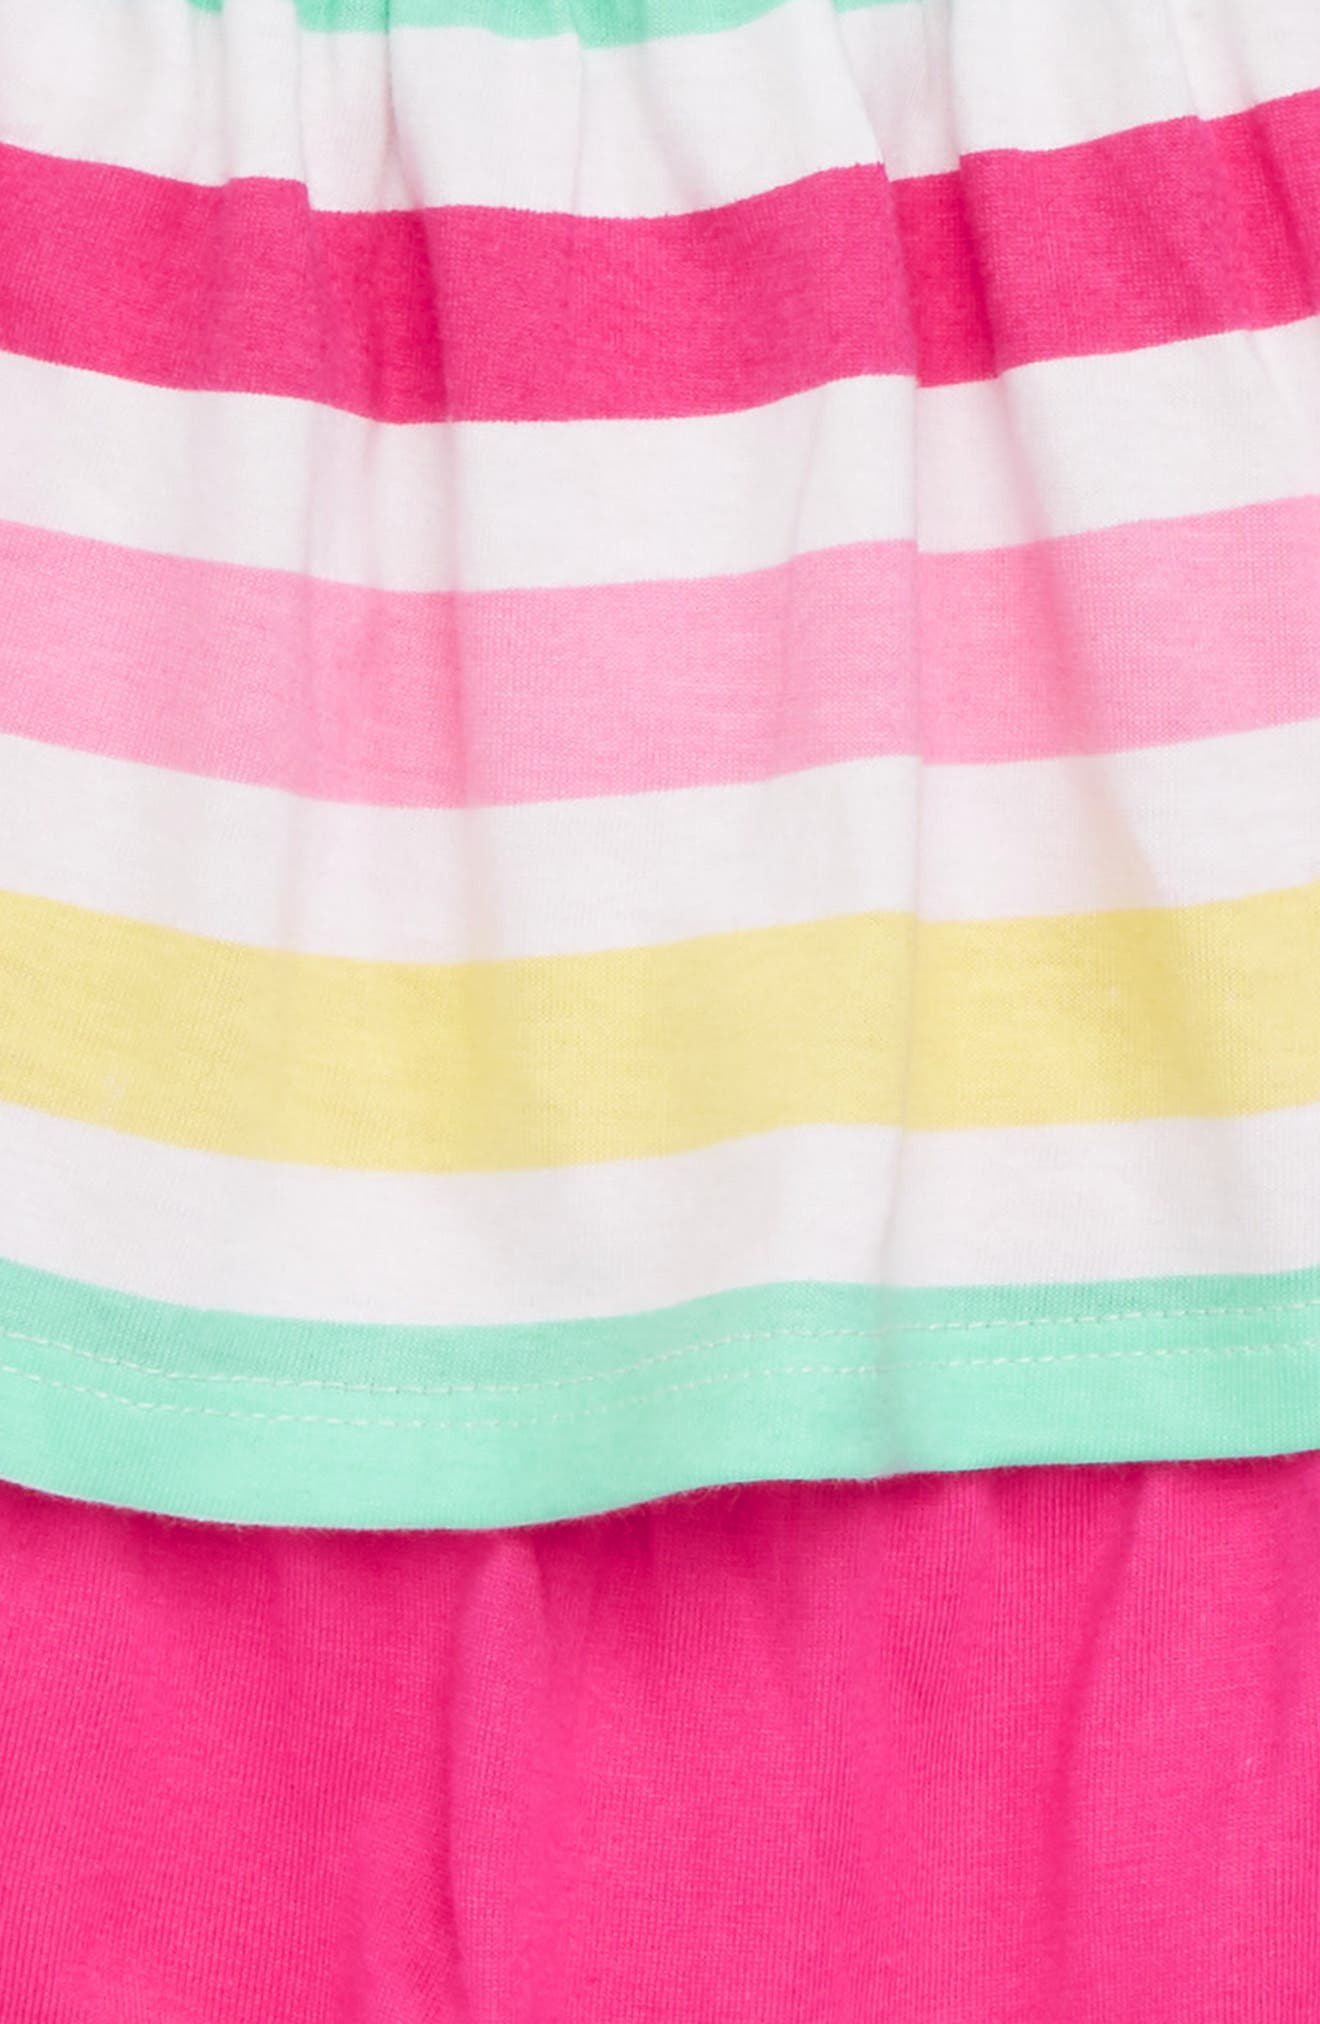 Popover Romper,                             Alternate thumbnail 2, color,                             Fuchsia Summer Stripe